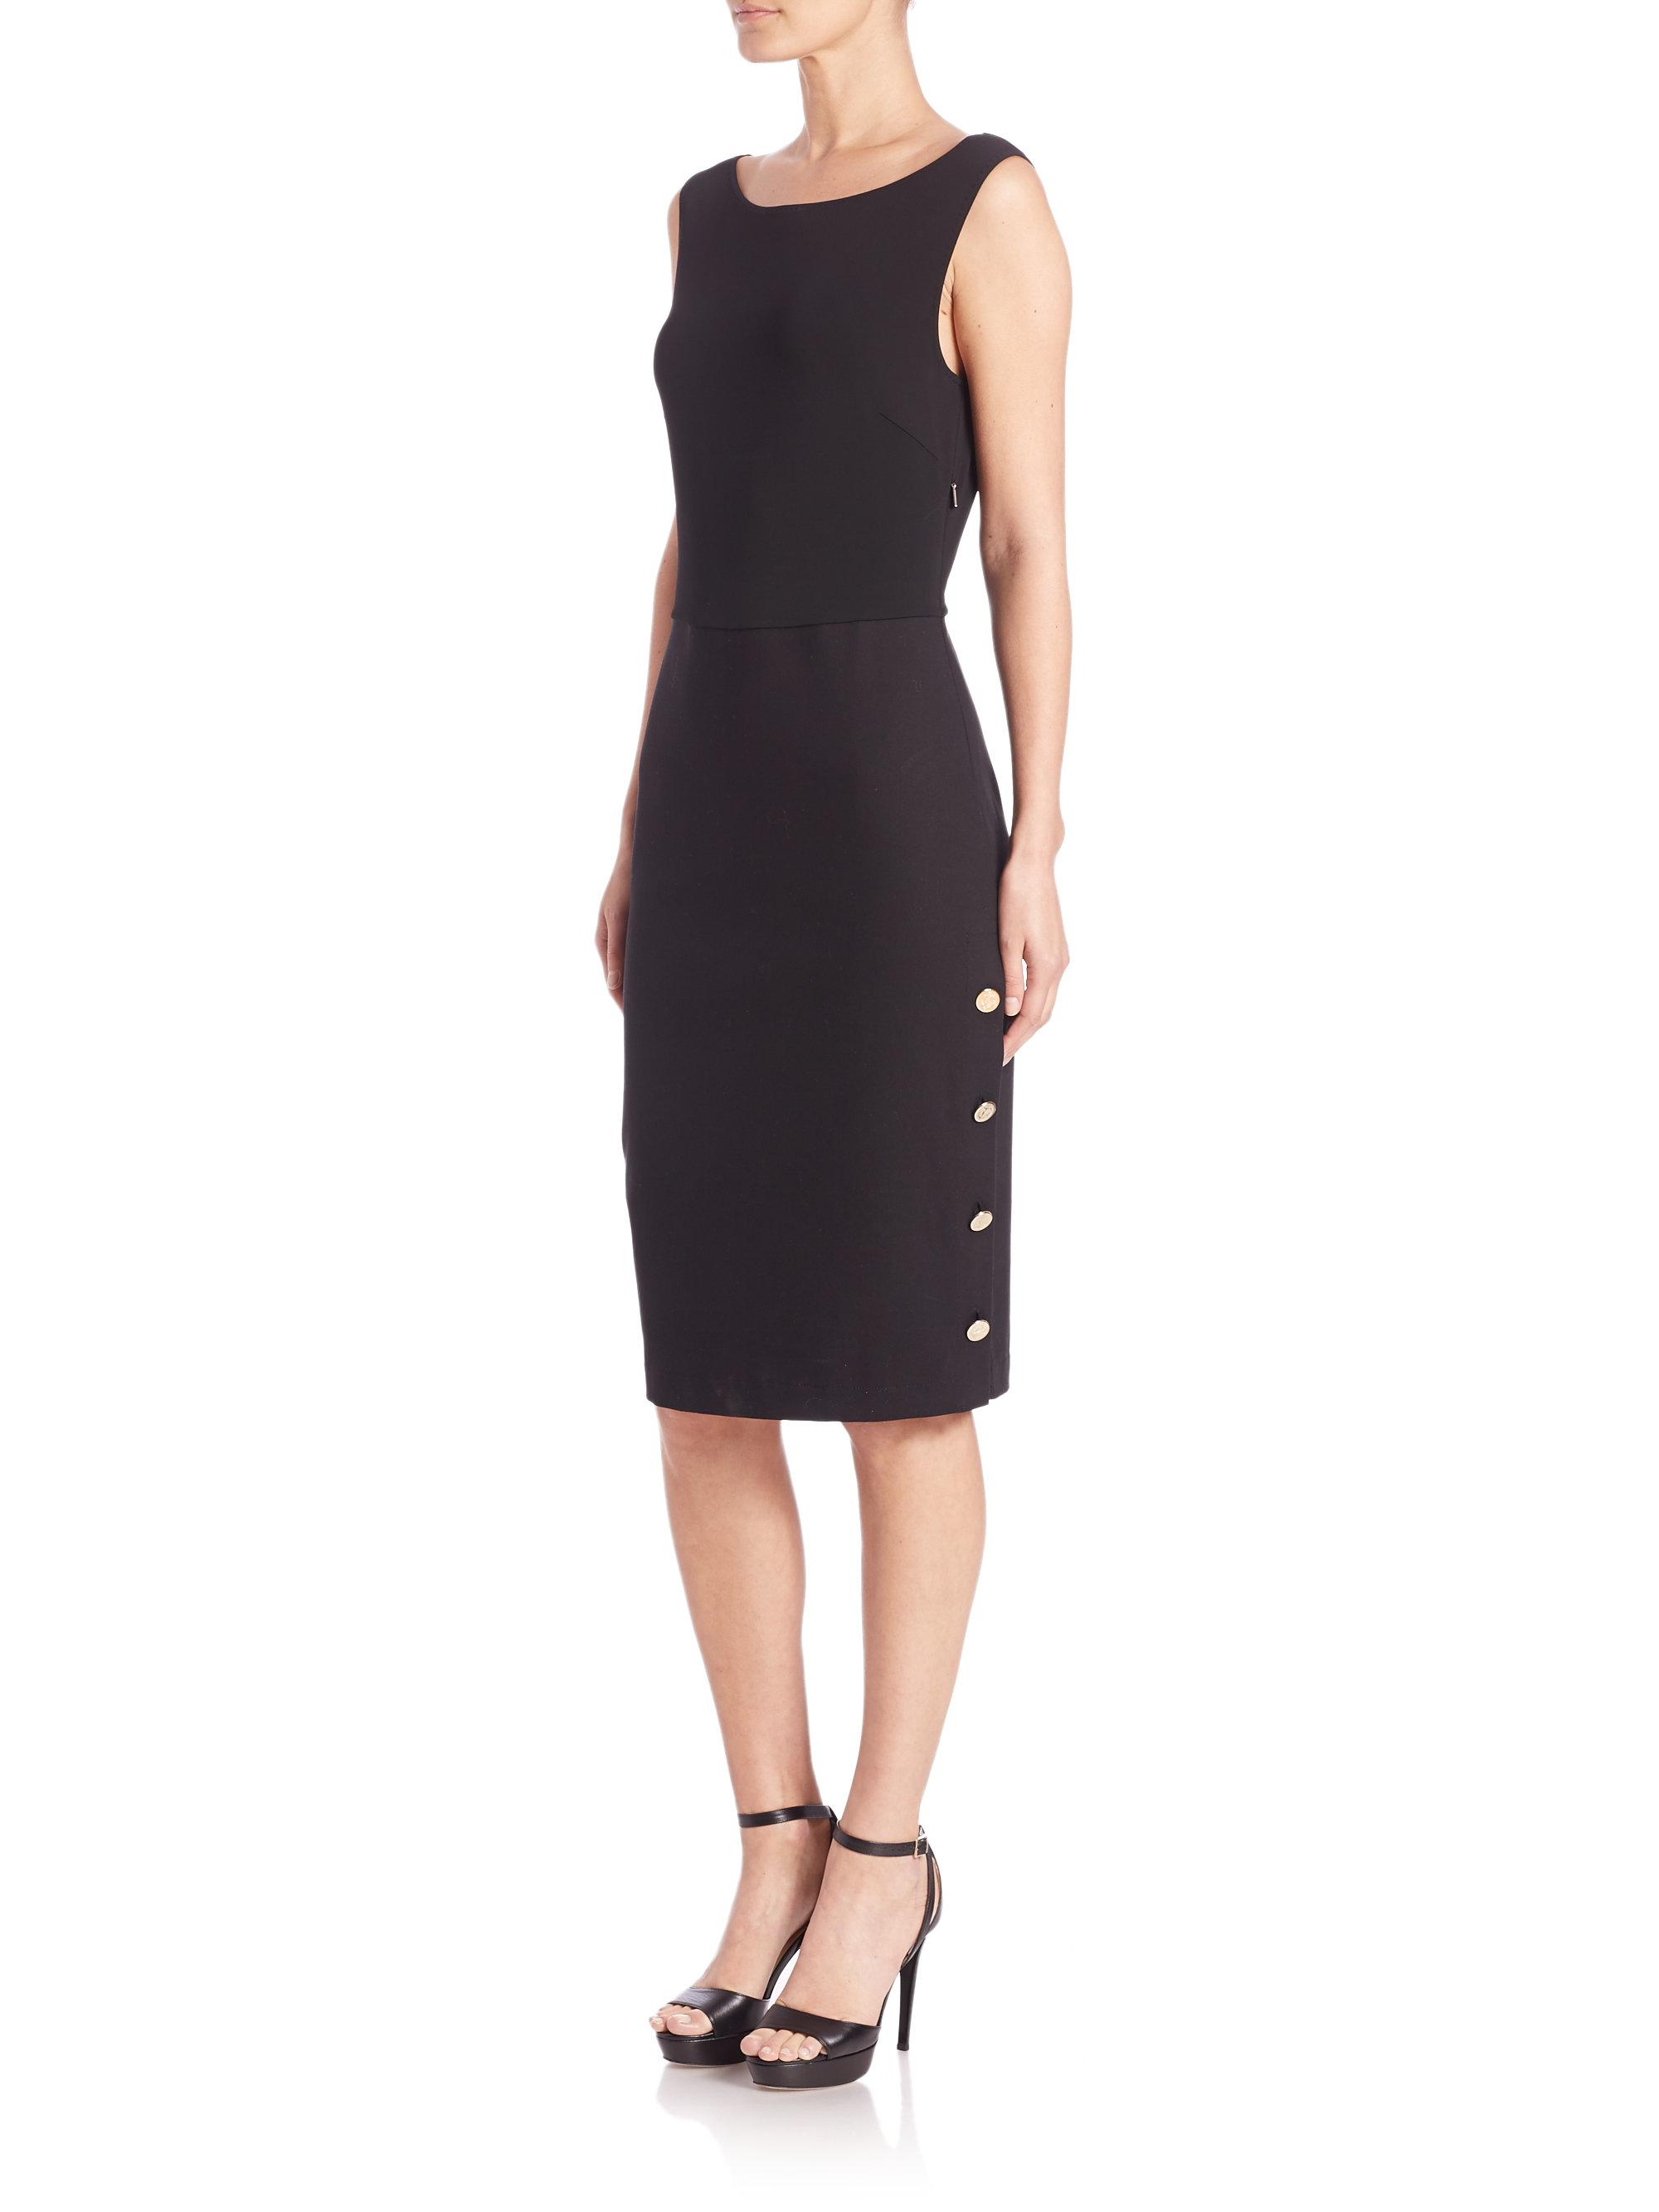 Max Mara Bassano Sleeveless Dress In Black Lyst